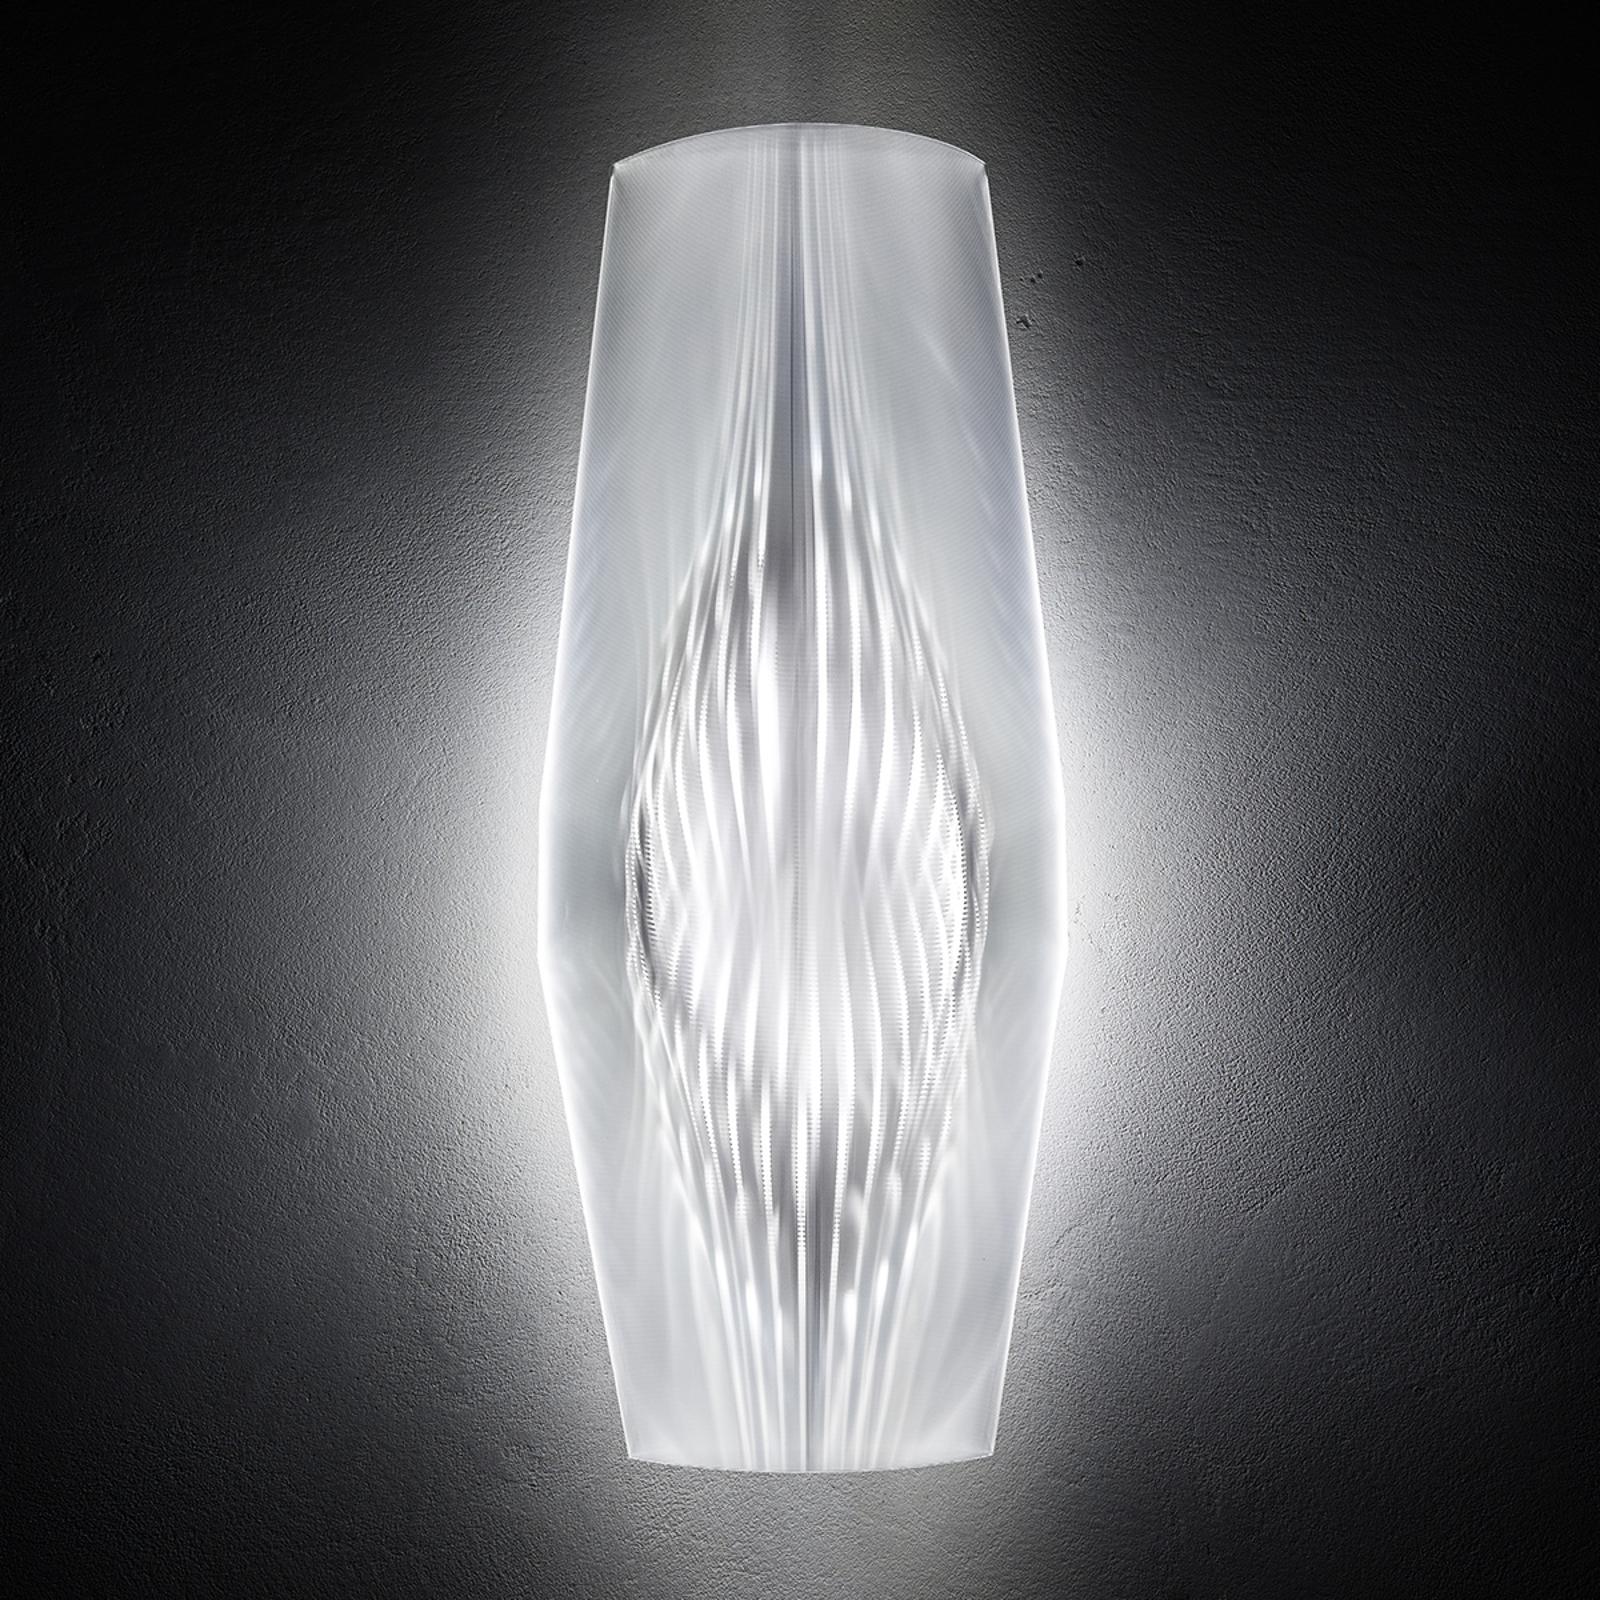 Applique de designer LED transparente Mirage